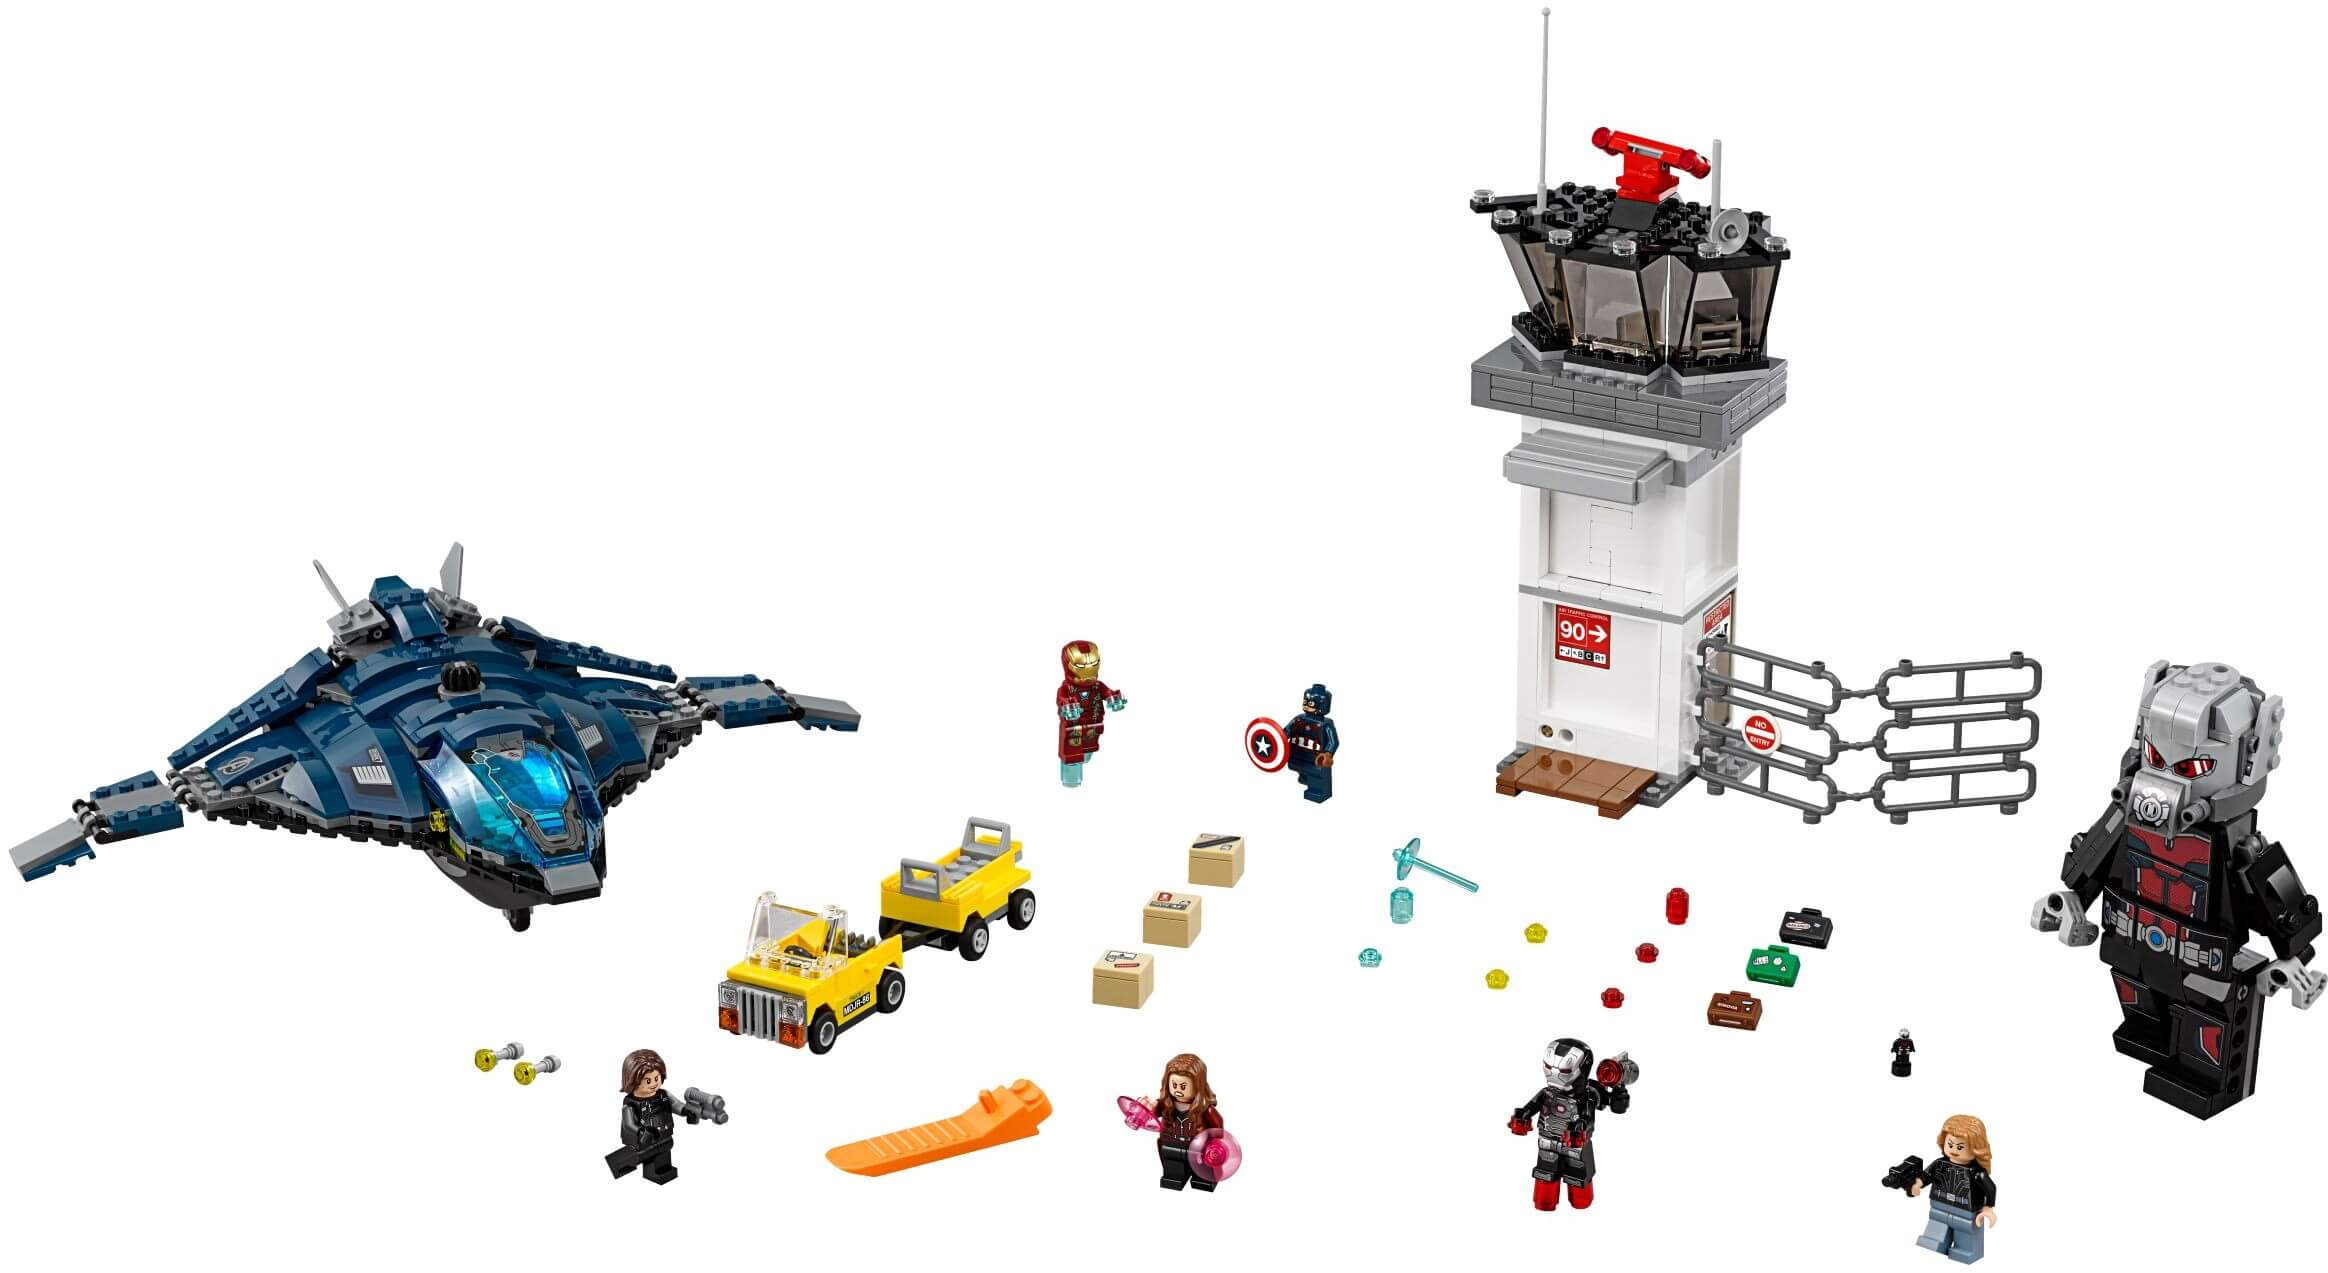 Mua đồ chơi LEGO 76051 - LEGO Marvel Super Heroes 76051 - Đại Chiến tại Sân Bay (LEGO Marvel Super Heroes Super Hero Airport Battle 76051)